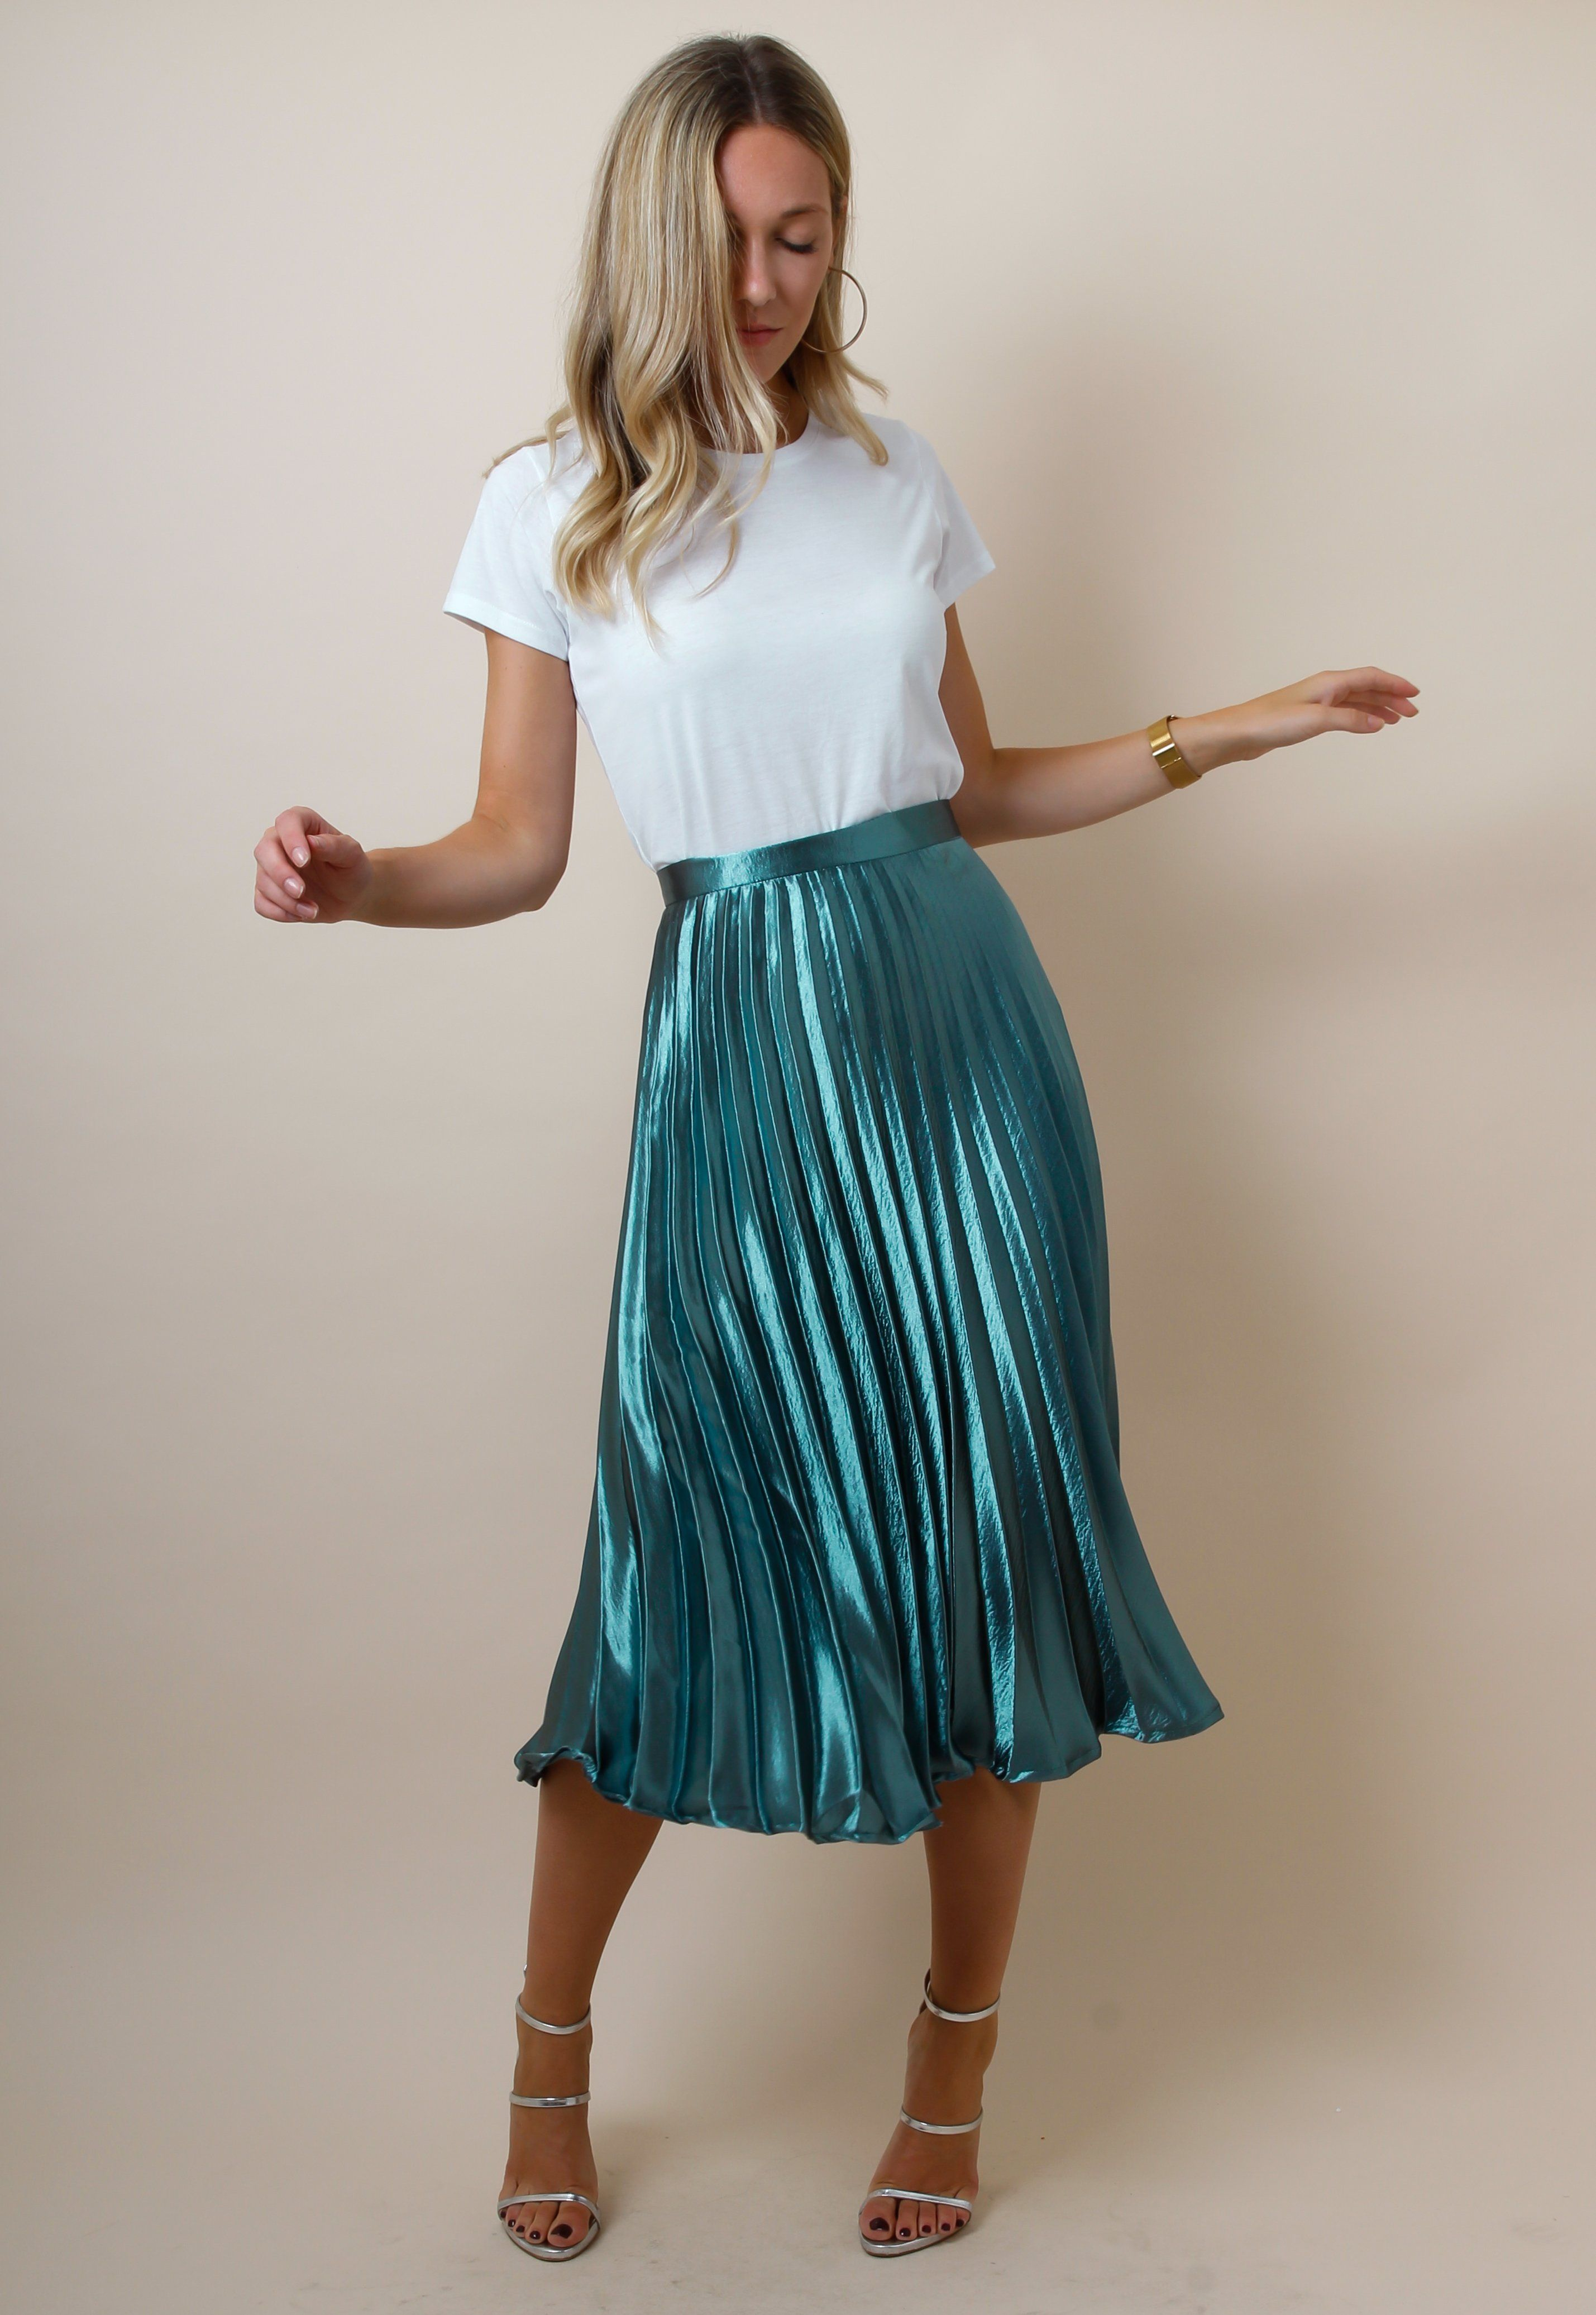 Pretty Lavish u Metallic Satin Pleated Midi Skirt Teal Fashion